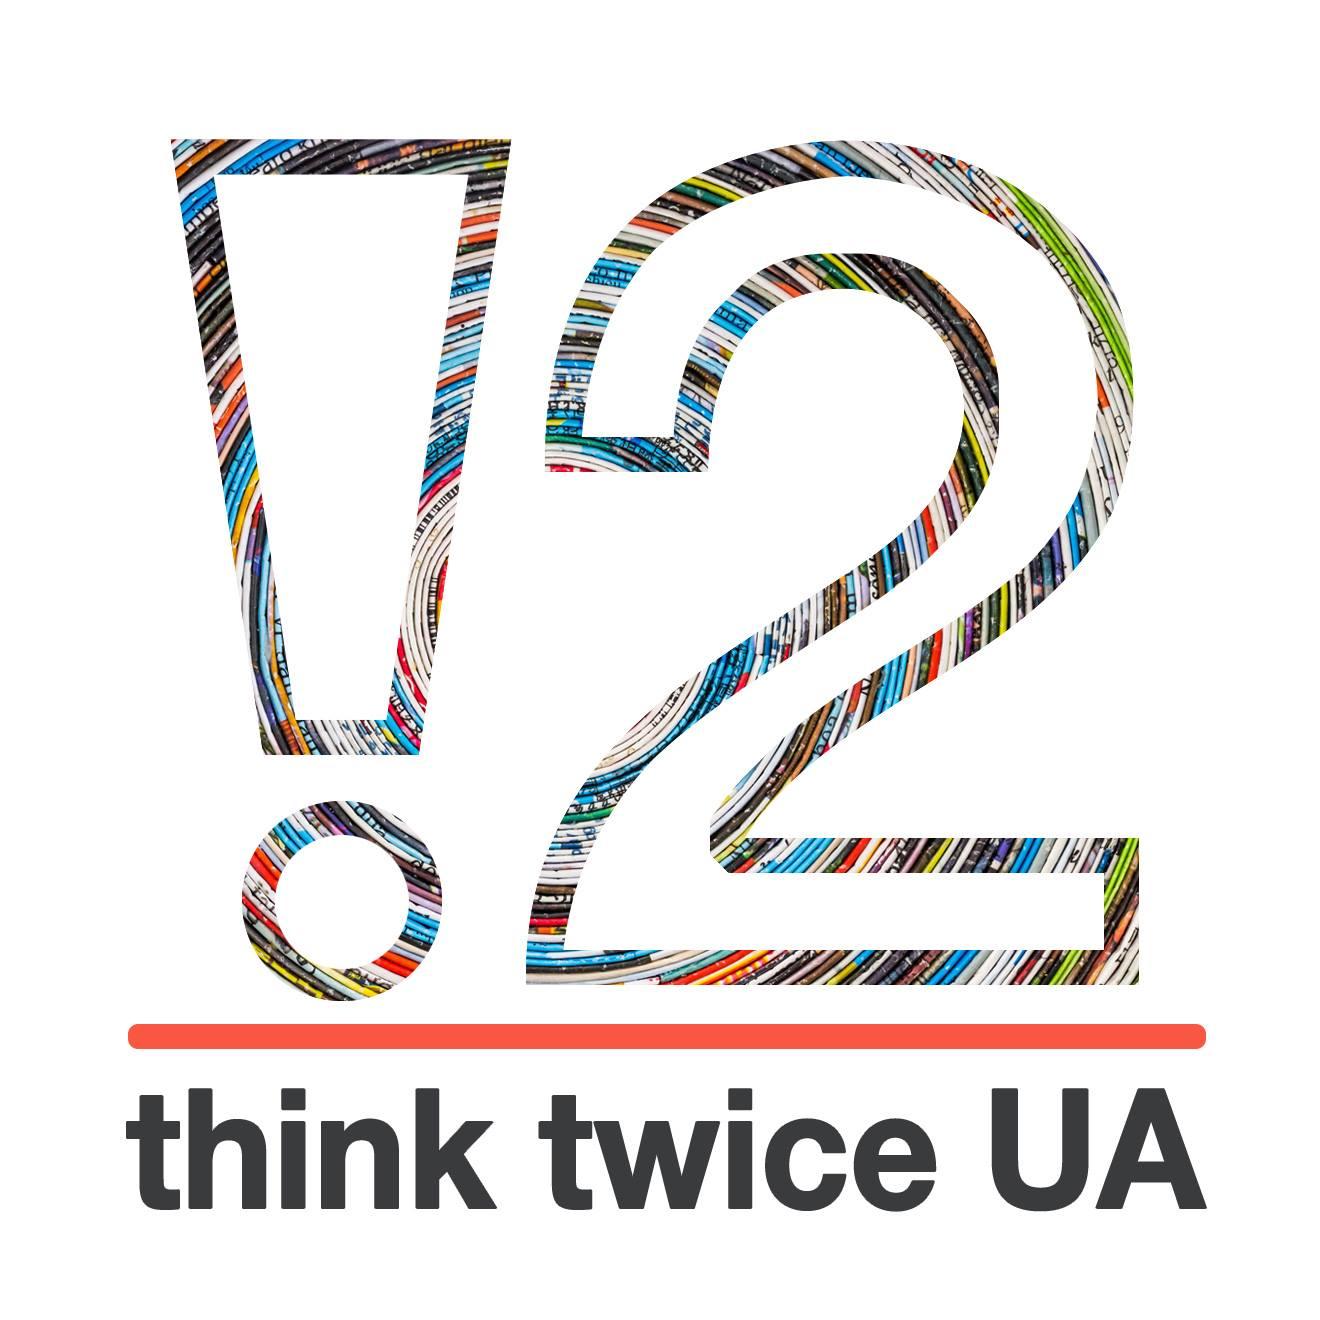 think-twice-neu-e1504782854381